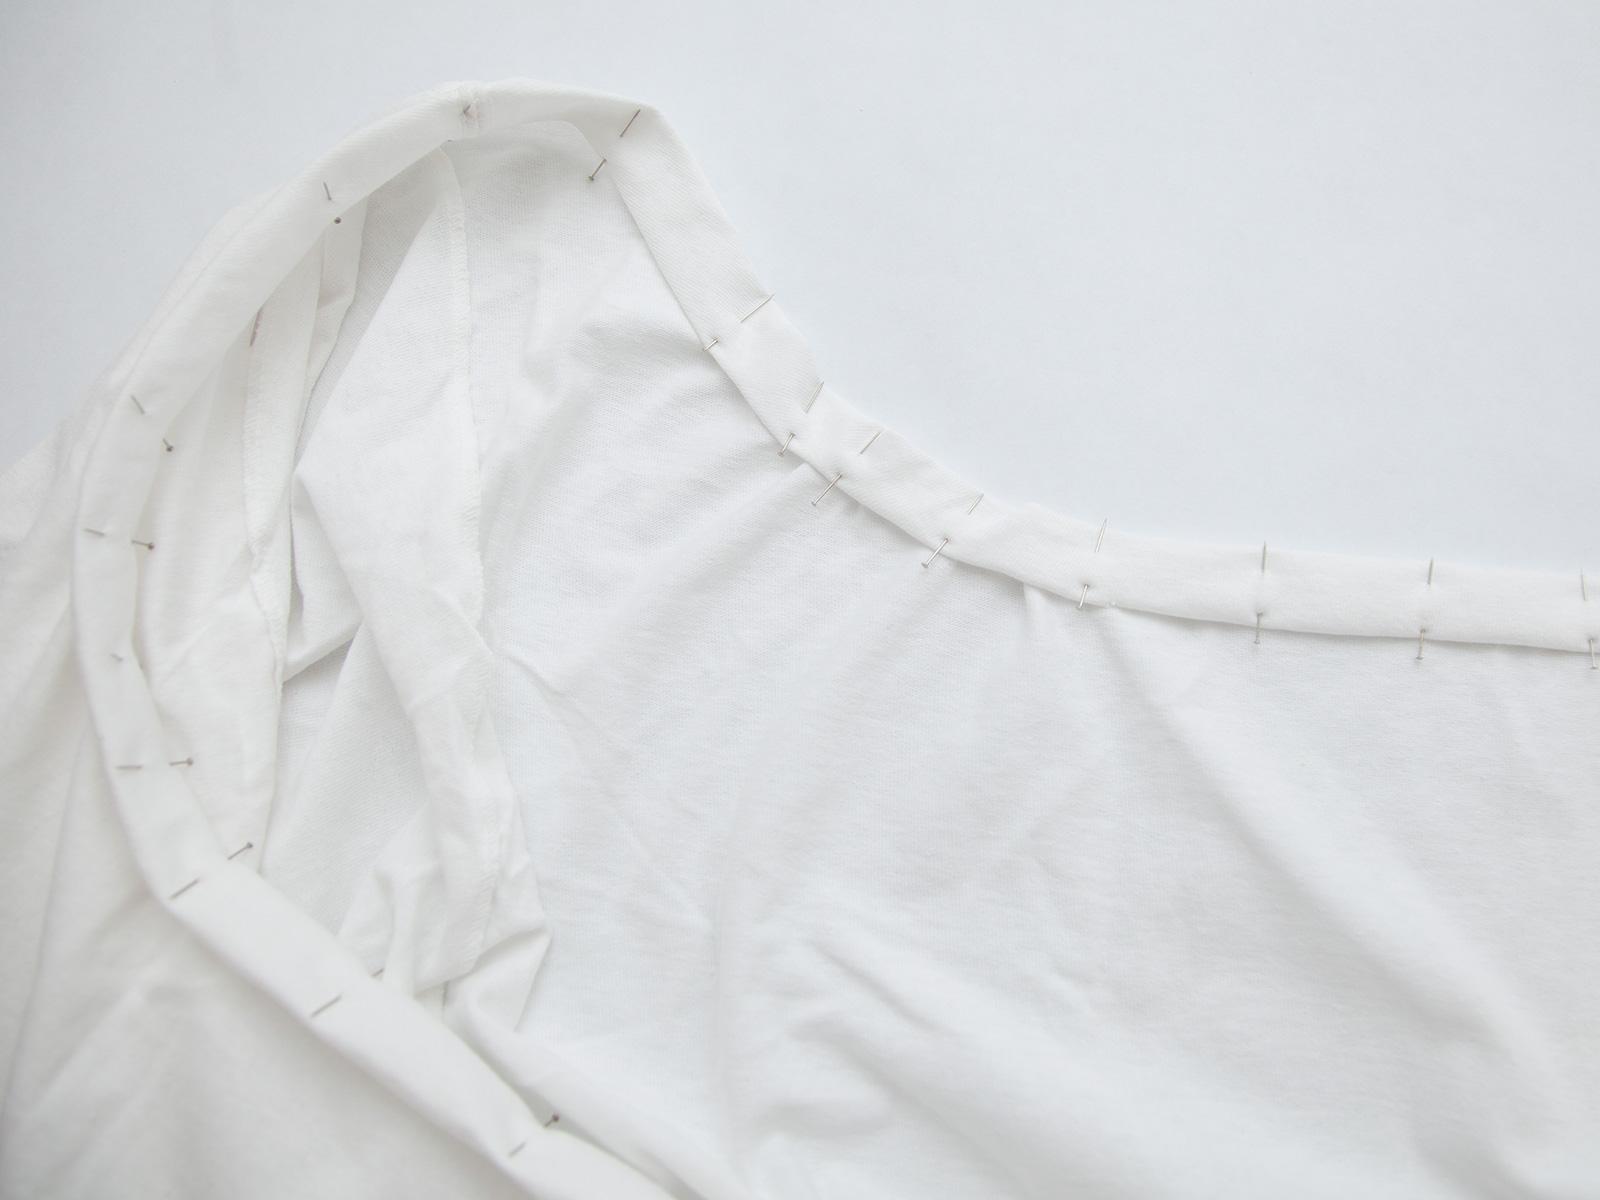 DIY Off the Shoulder Dress pinning the neck